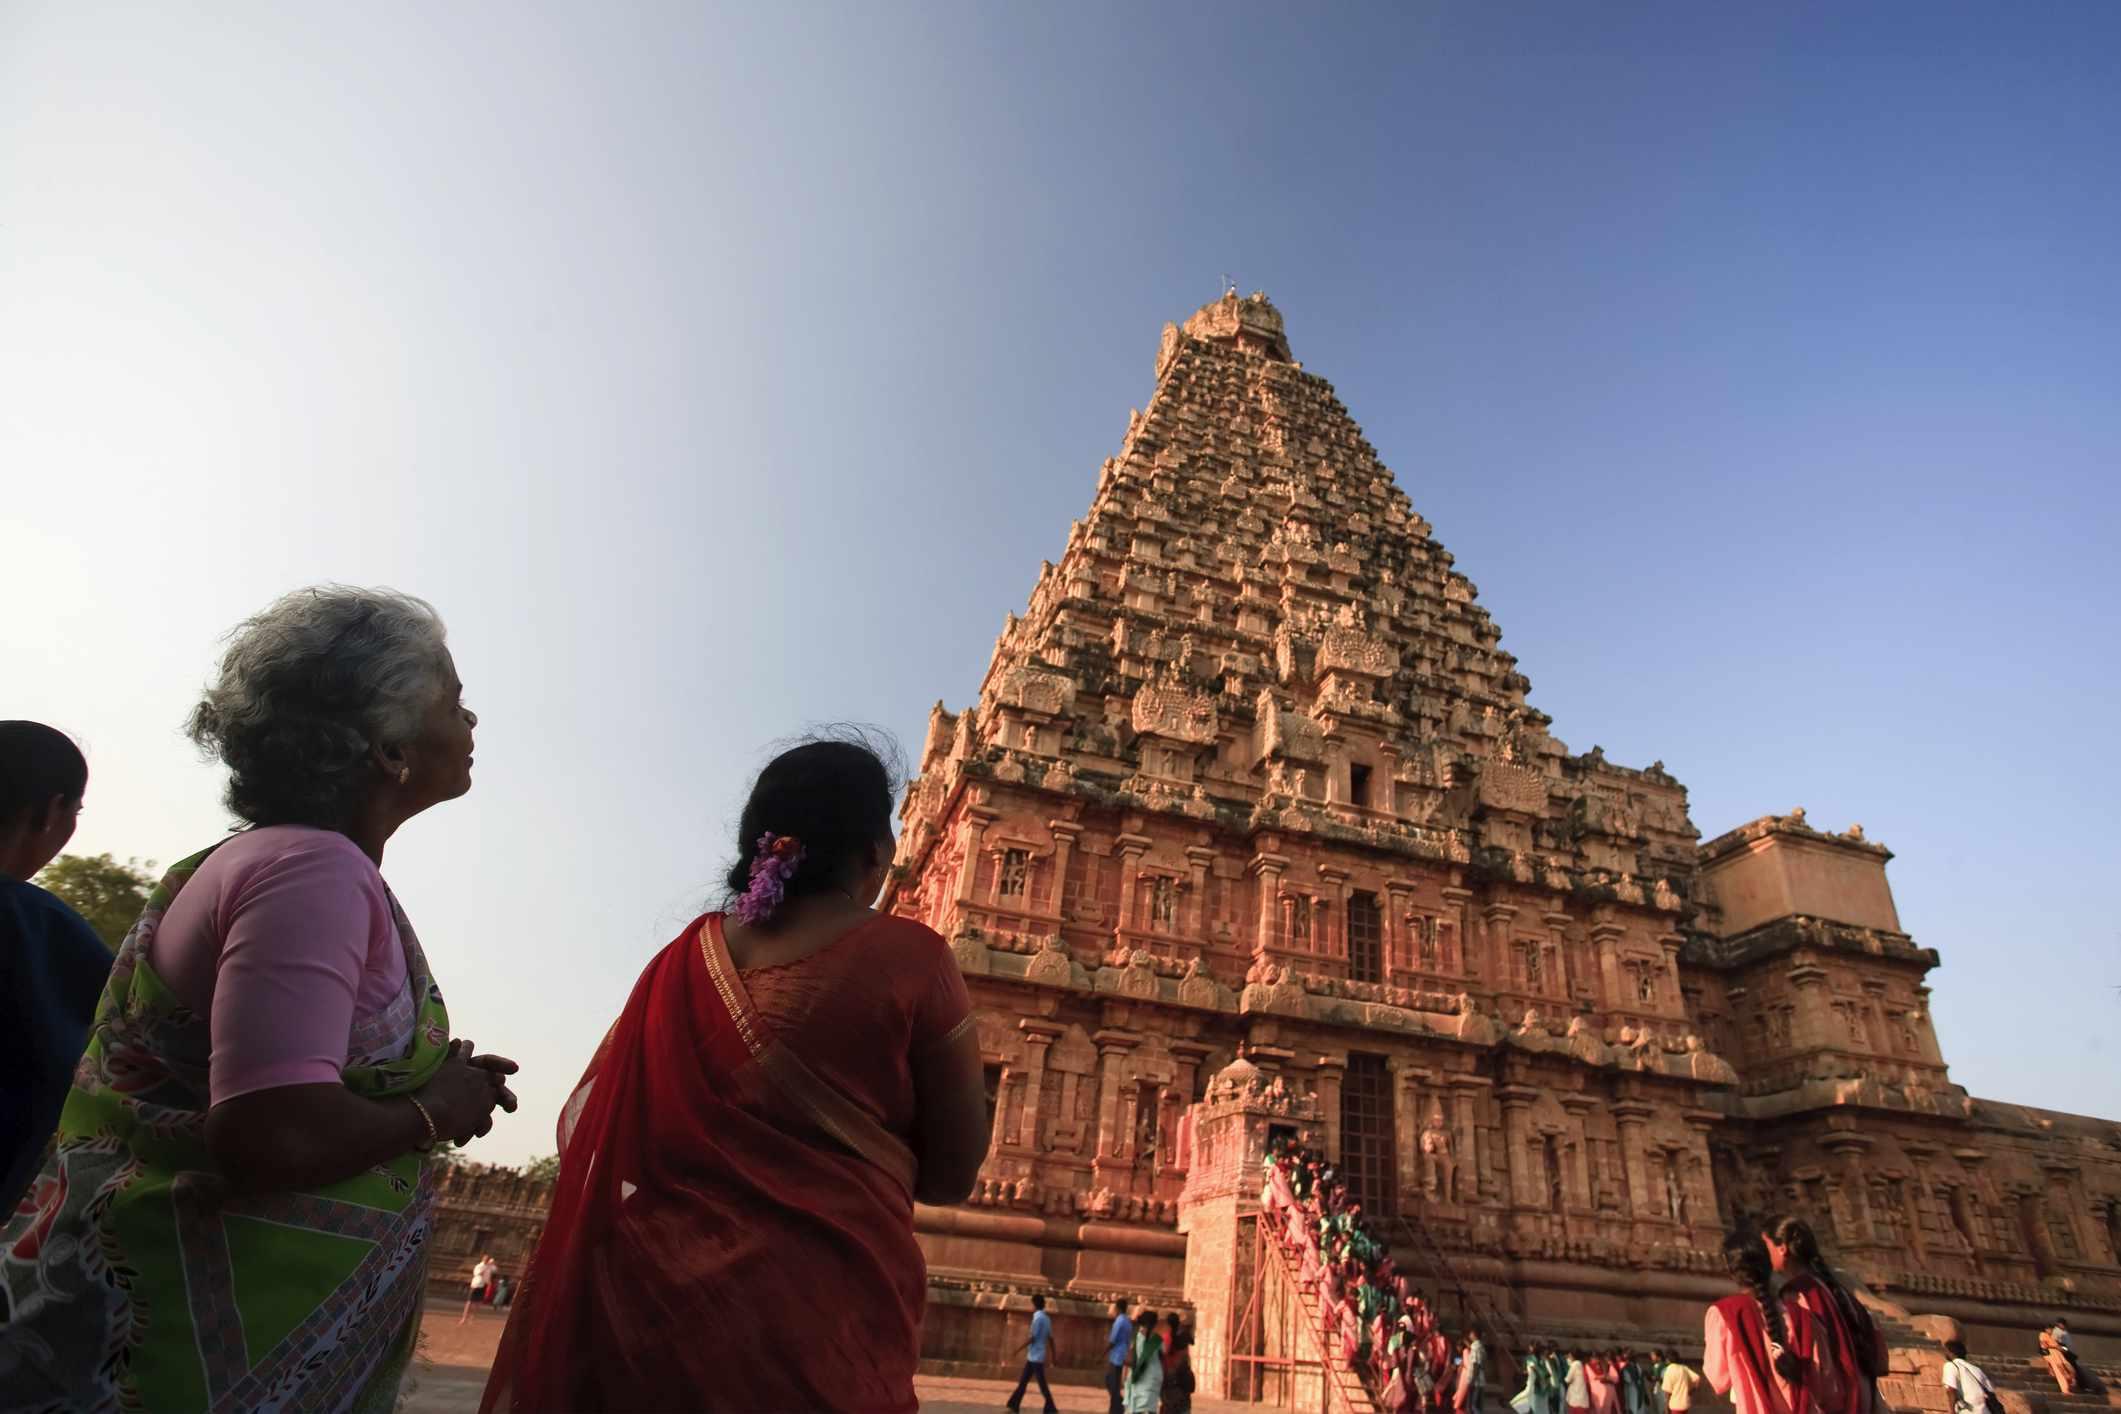 The Big Temple, Thanjavur.